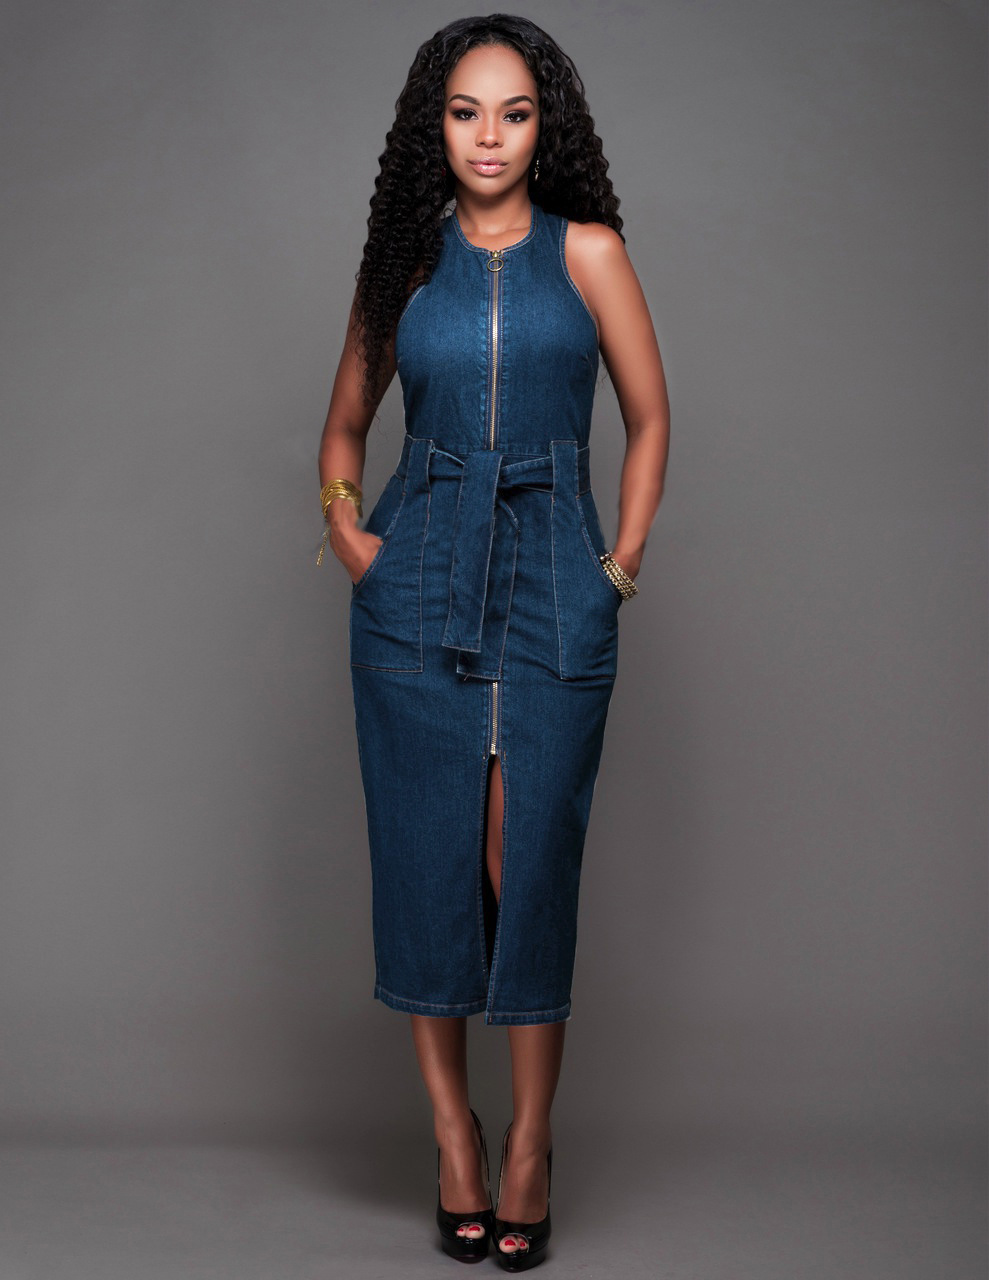 2018 Women Sleeveless Jeans Casual Slim Blue Jeans Sexy Bodycon Sashes Long Dresses Zipper Pockets Denim Dress Vestido Plus Size